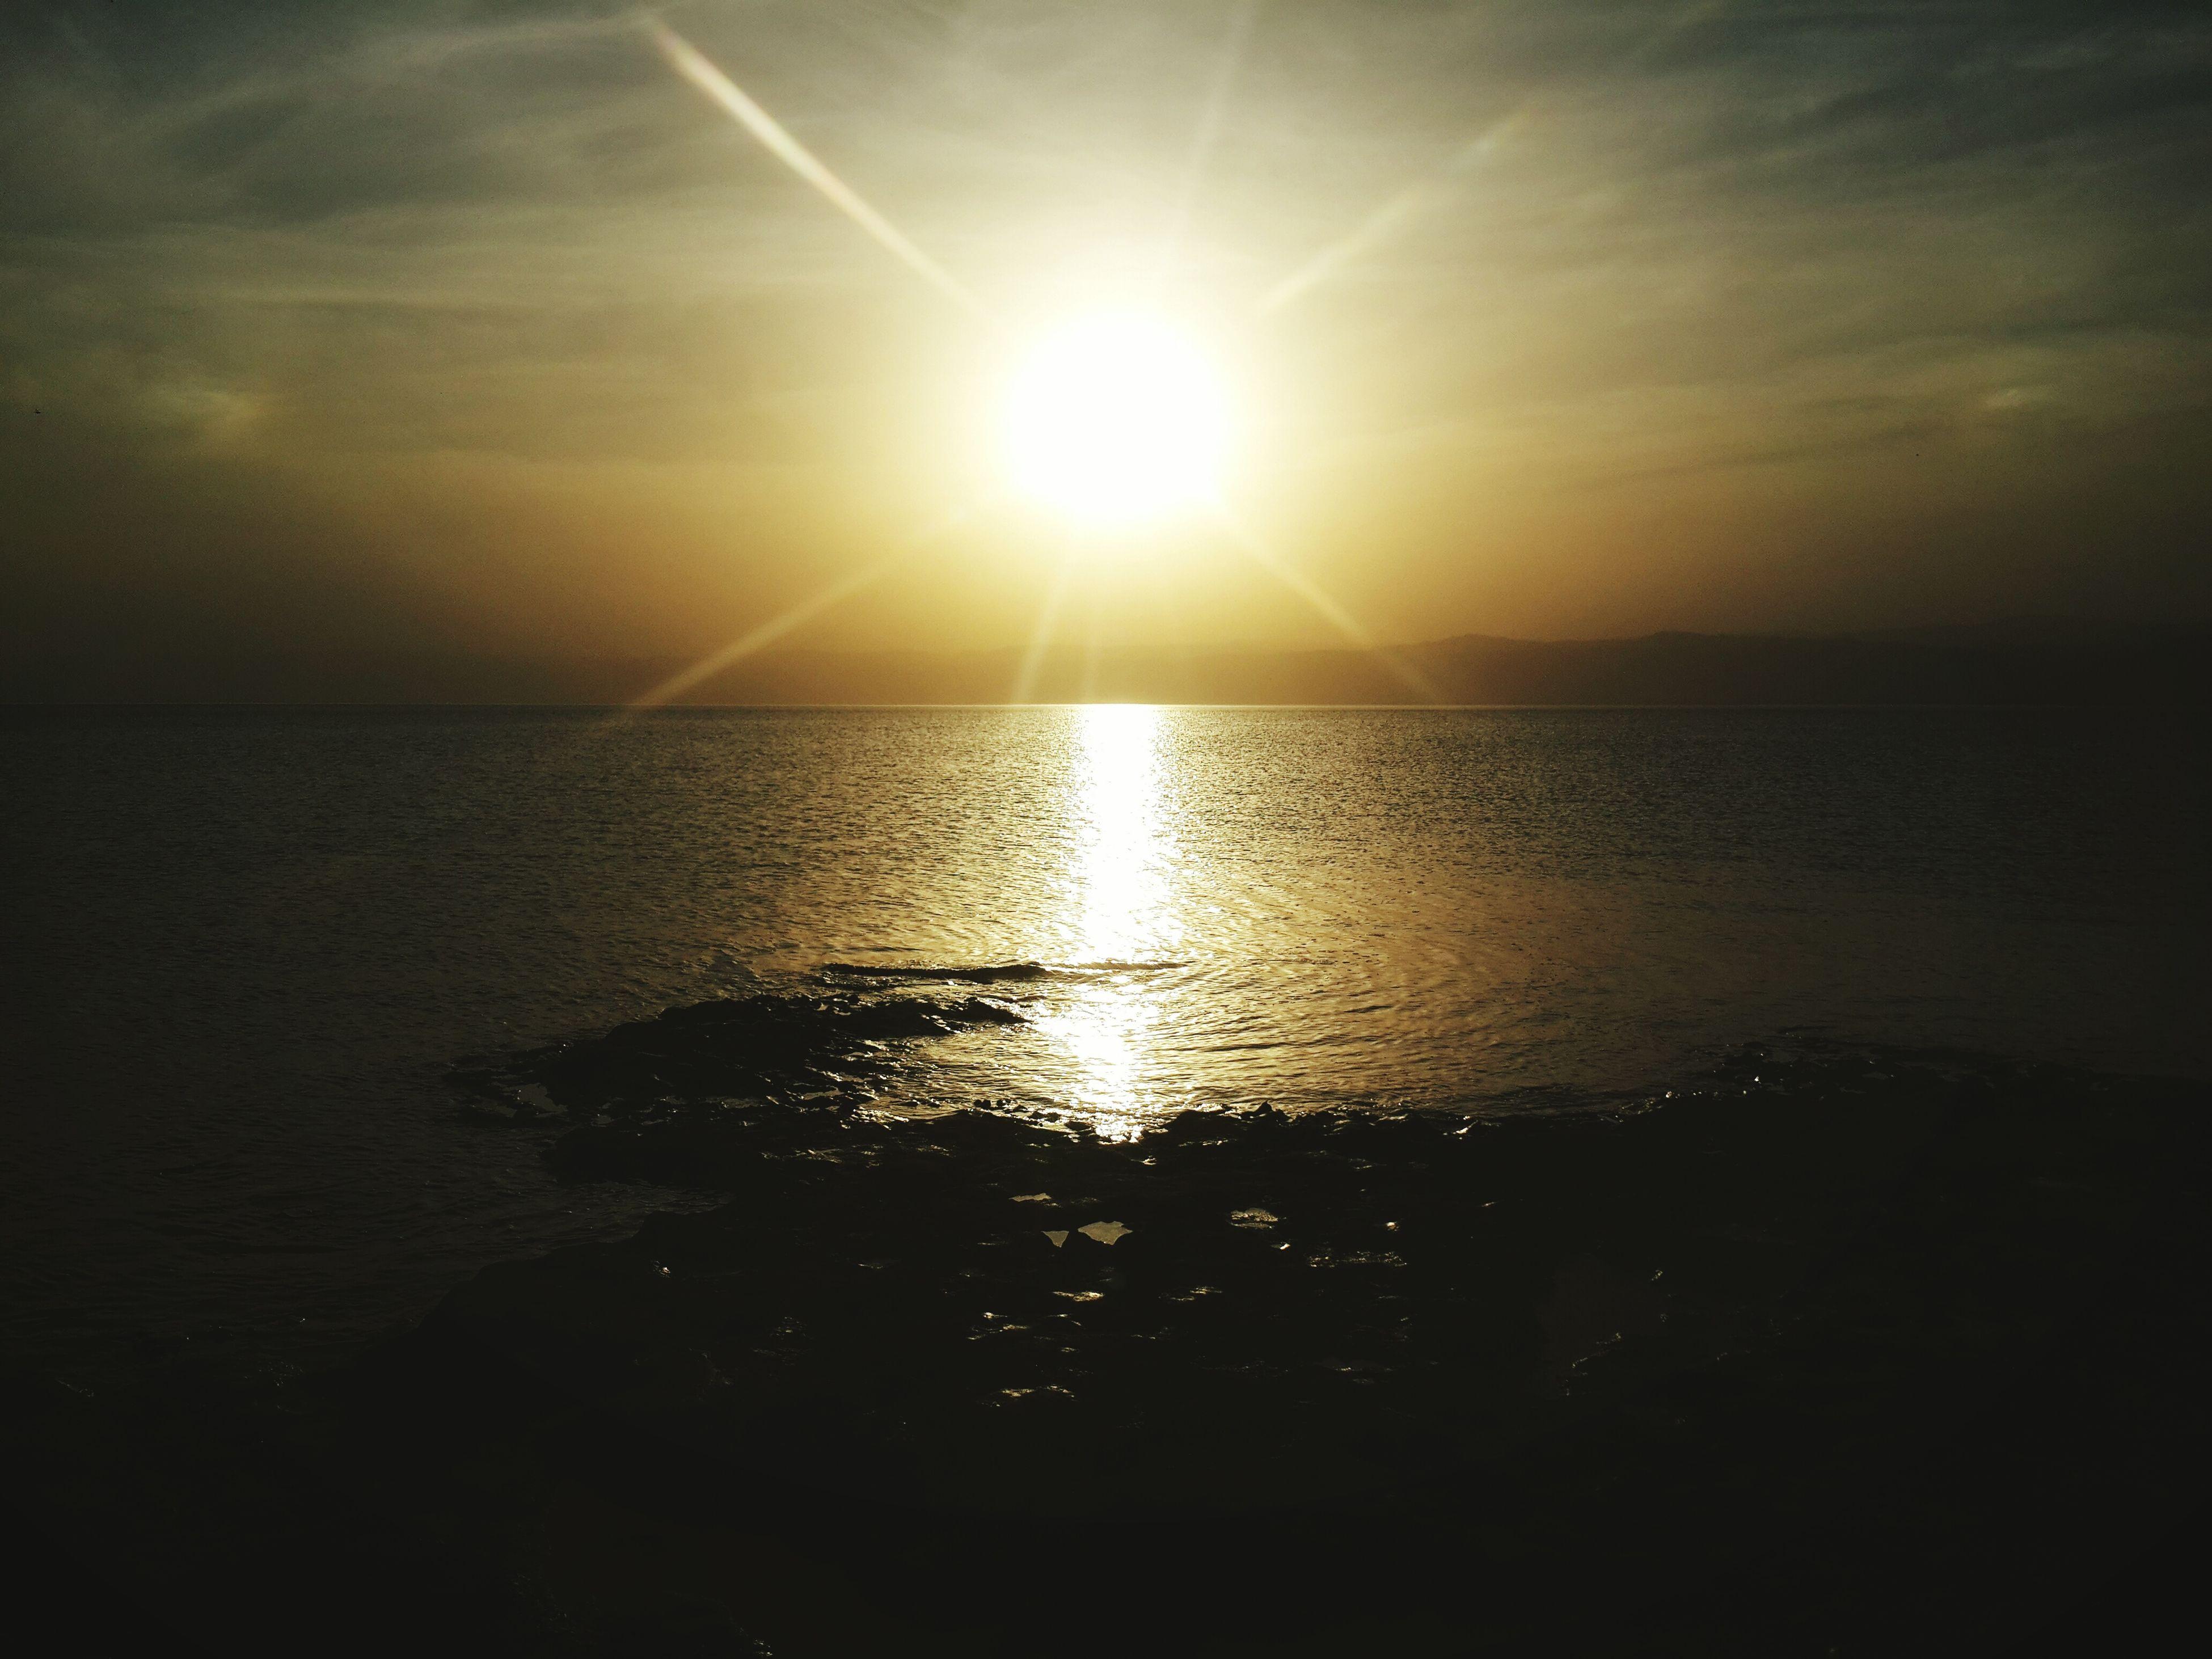 water, sun, sea, horizon over water, reflection, tranquil scene, sunset, scenics, tranquility, beauty in nature, sky, nature, sunlight, idyllic, silhouette, waterfront, rippled, sunbeam, beach, outdoors